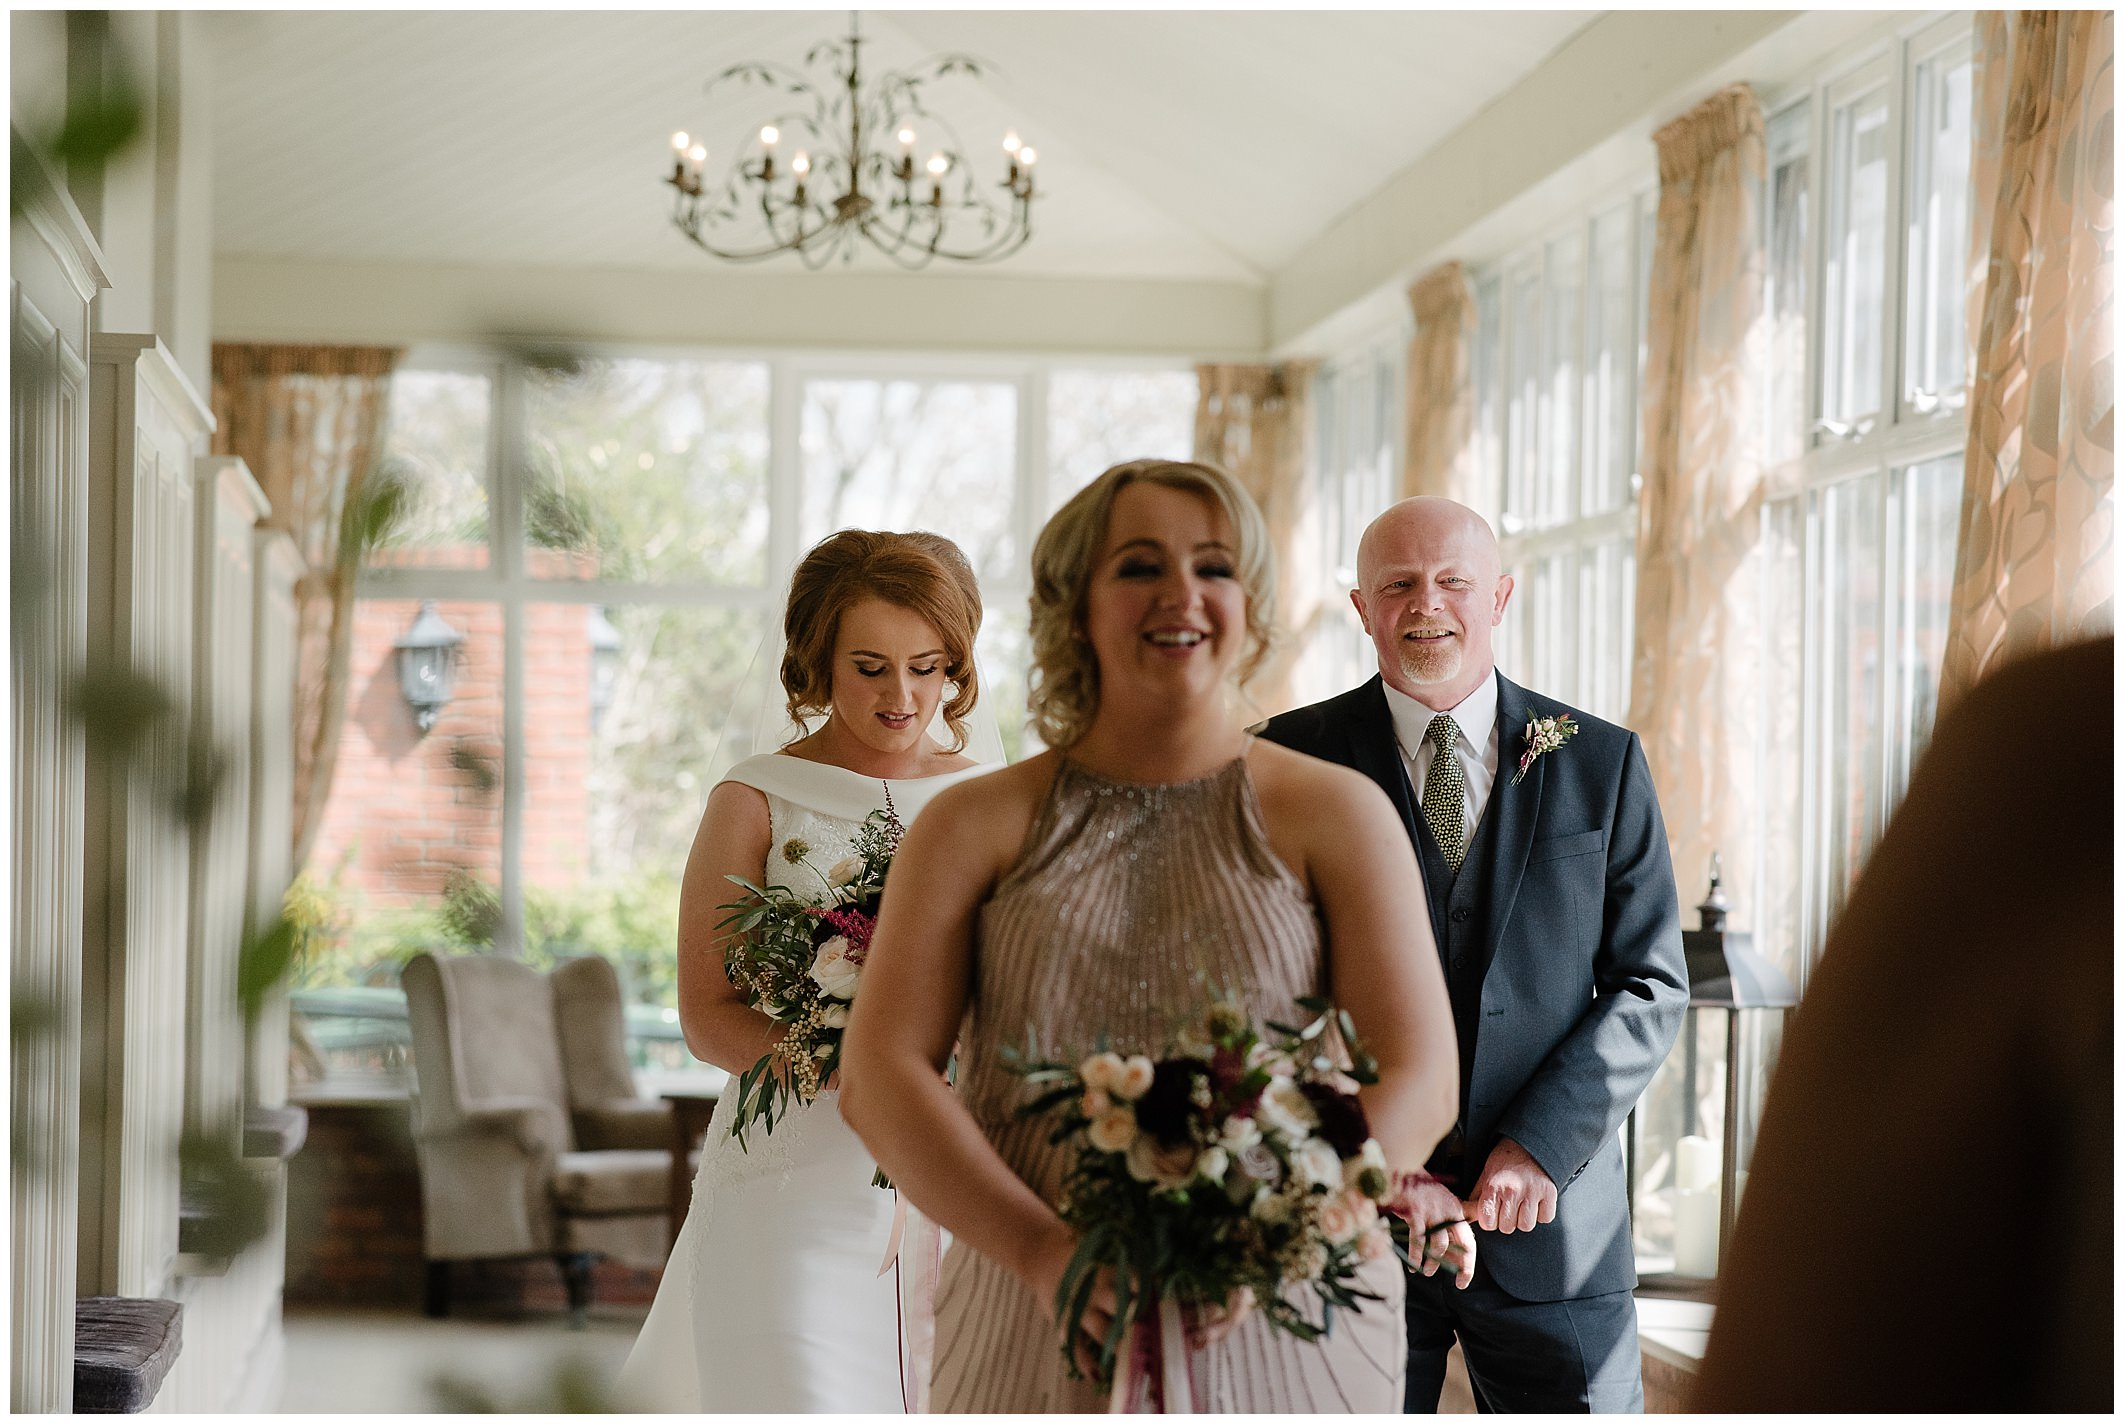 corick-house-wedding-hannah-gary-jude-browne-photography_0029.jpg